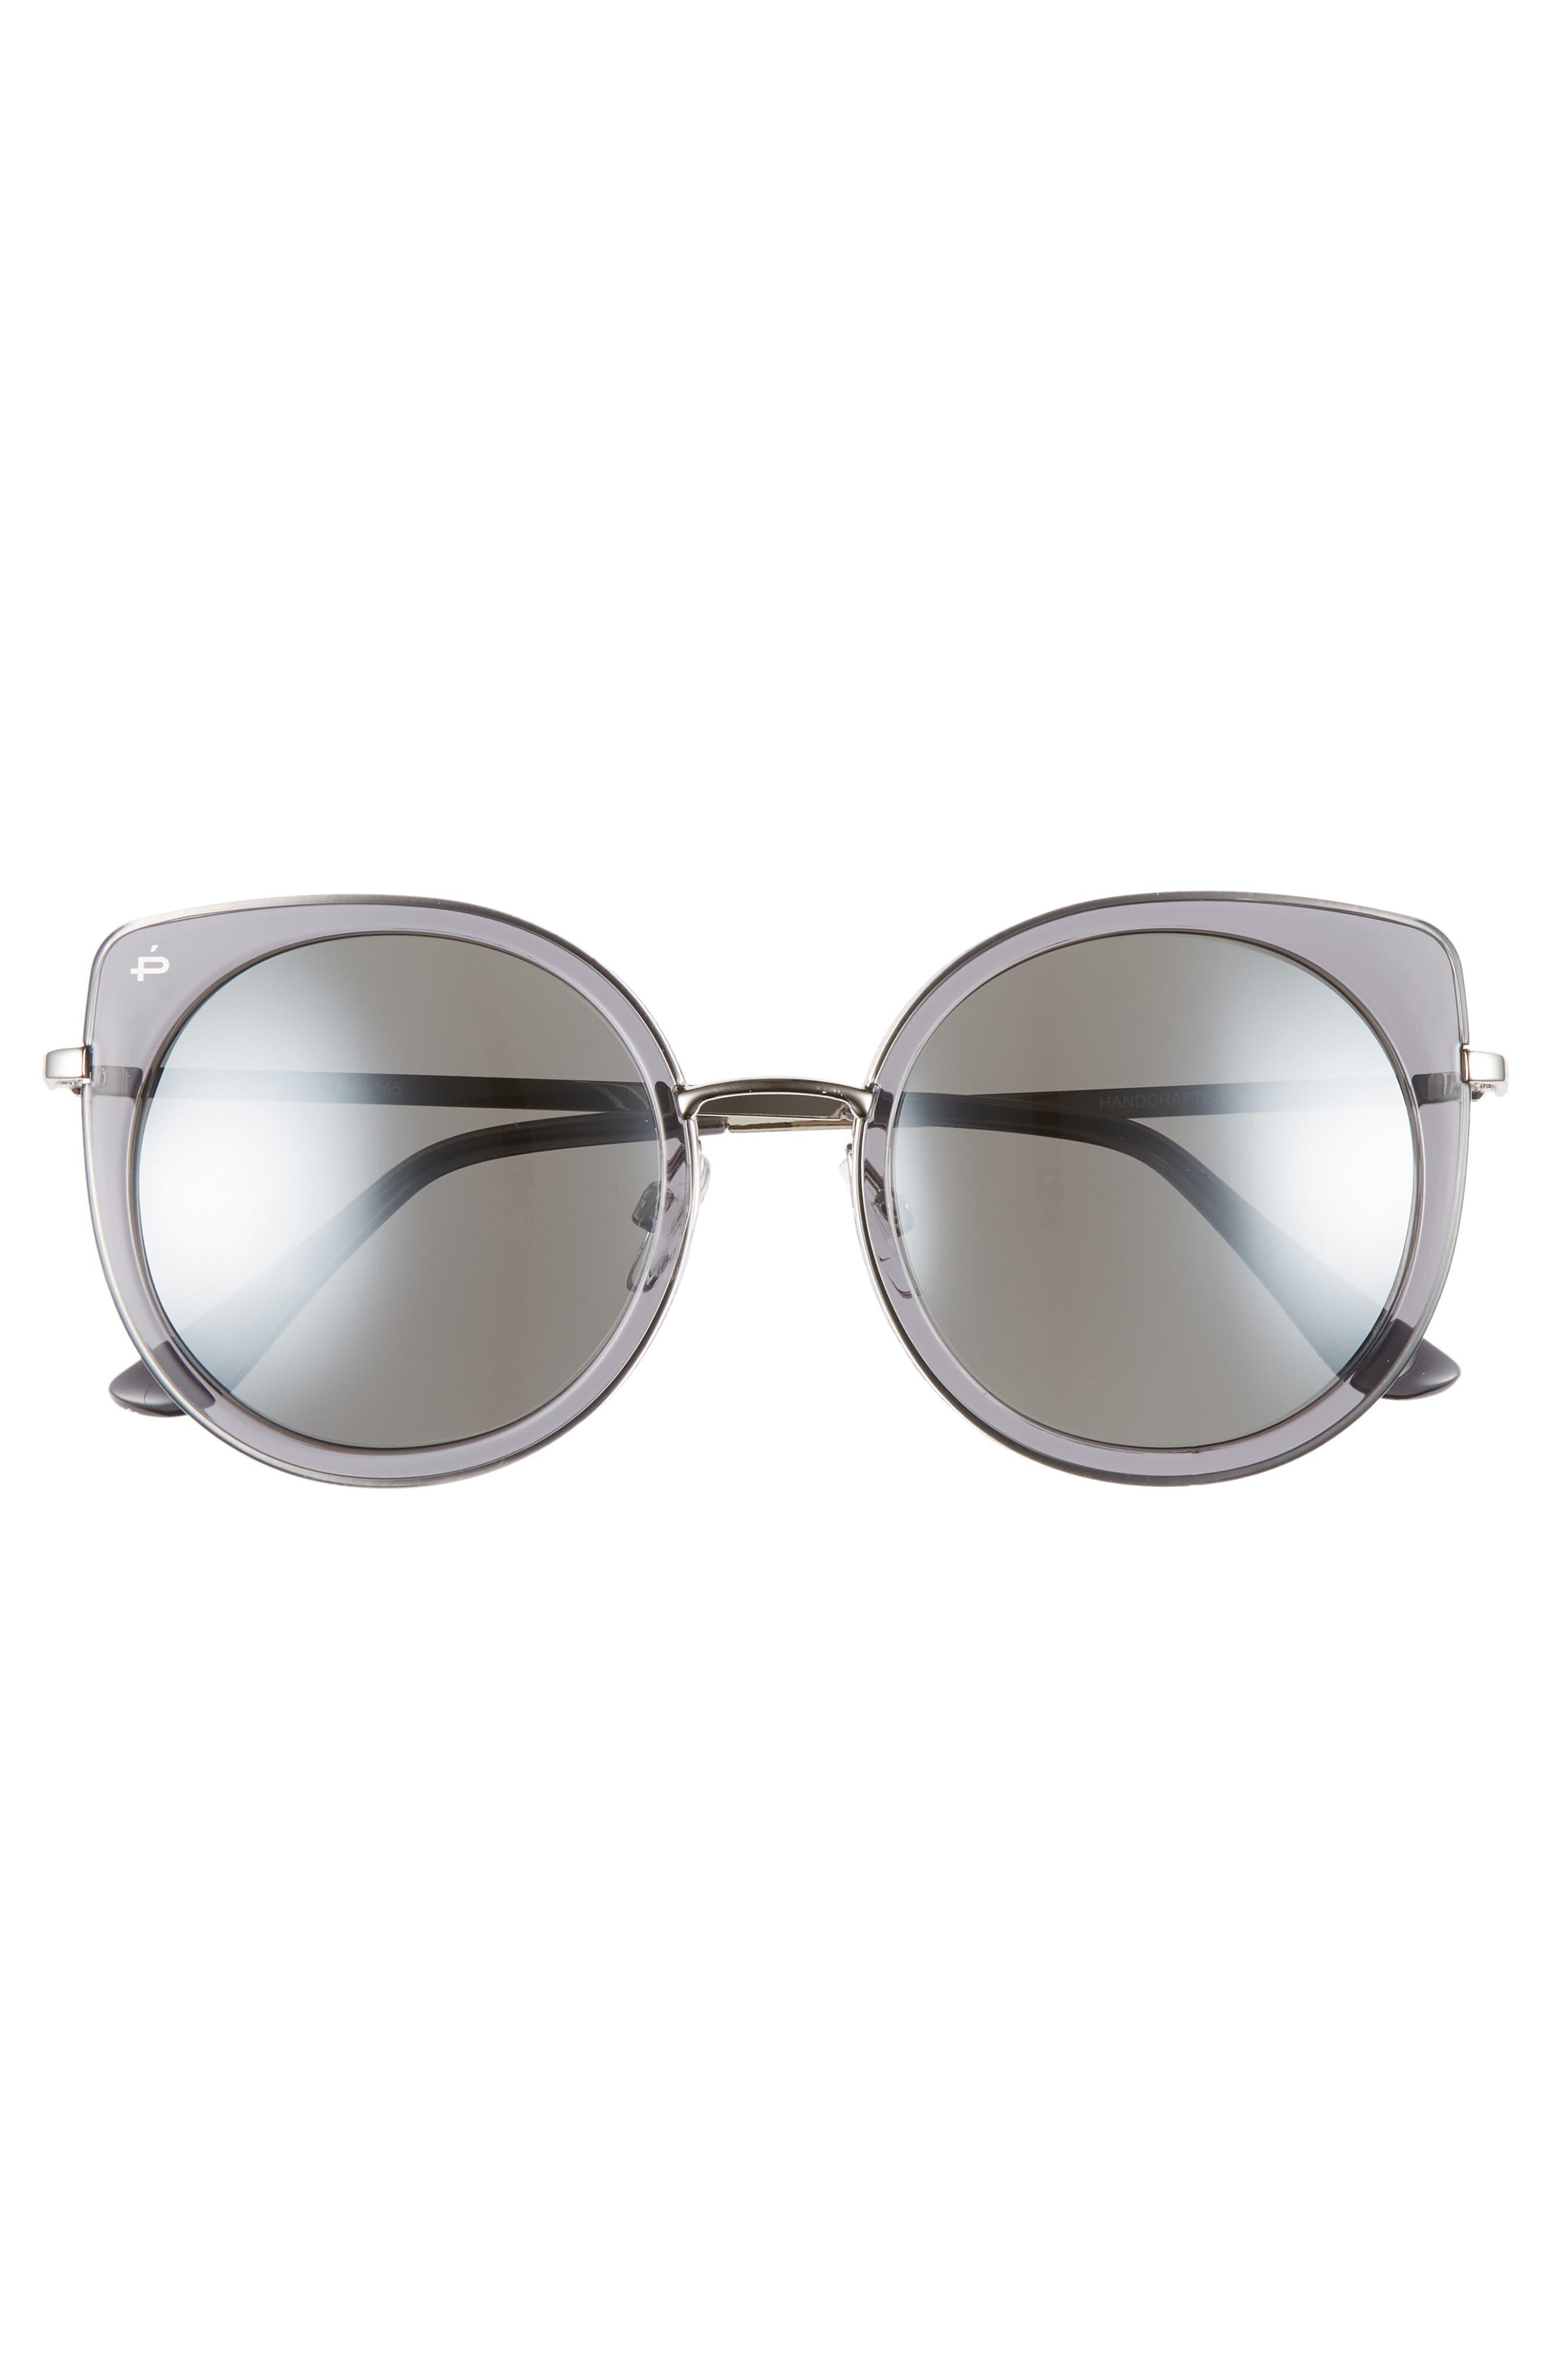 Privé Revaux The Georgian 53mm Sunglasses,                             Alternate thumbnail 3, color,                             CRYSTAL SMOKE